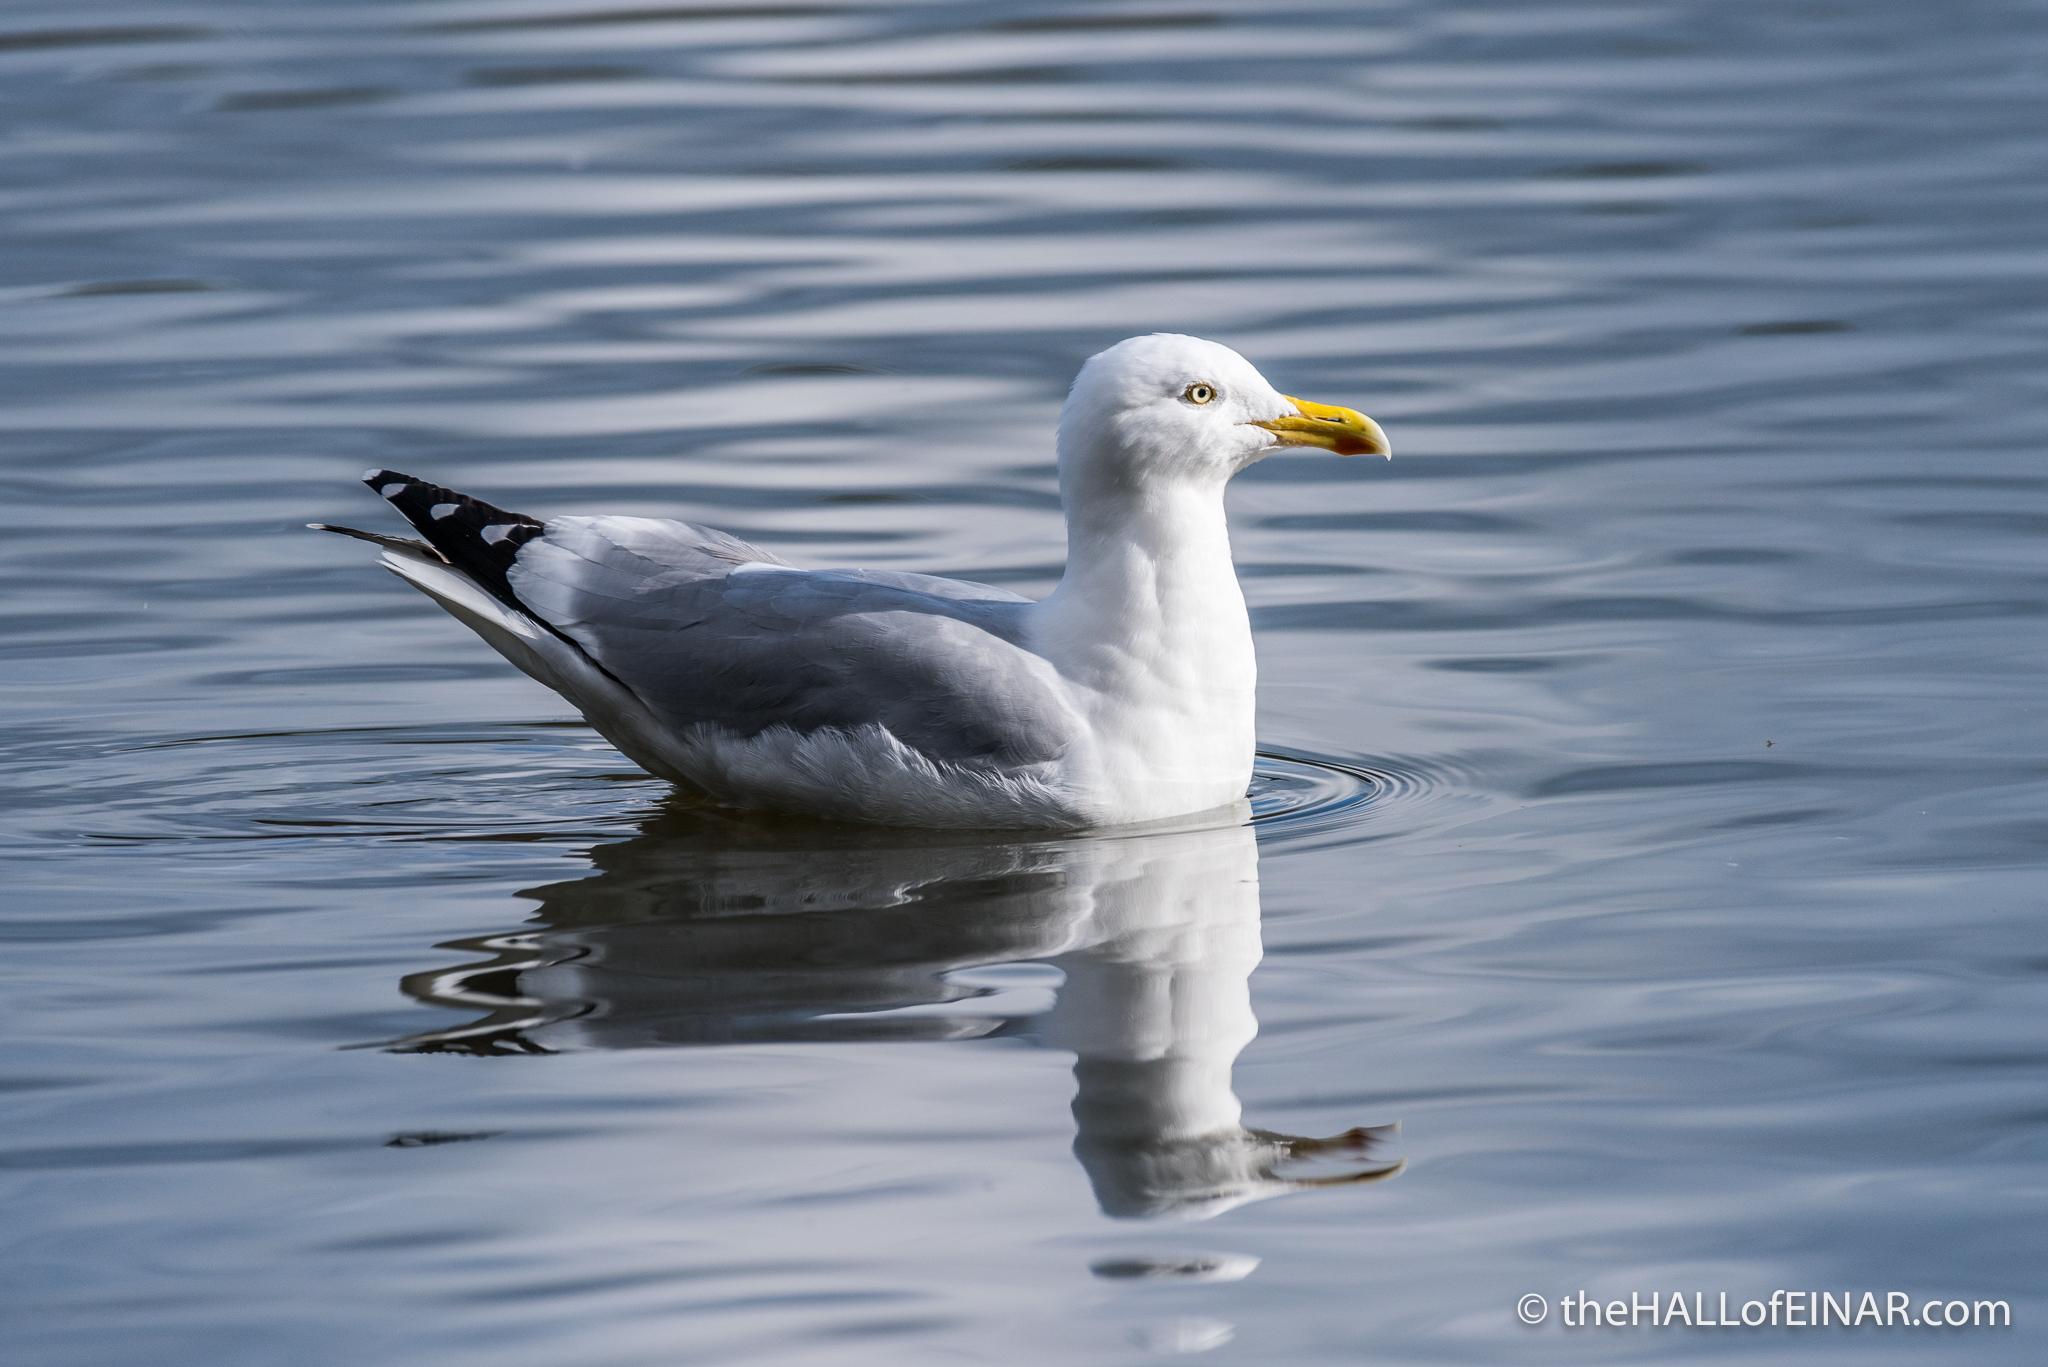 Herring Gull - The Hall of Einar - photograph (c) 2016 David Bailey (not the)